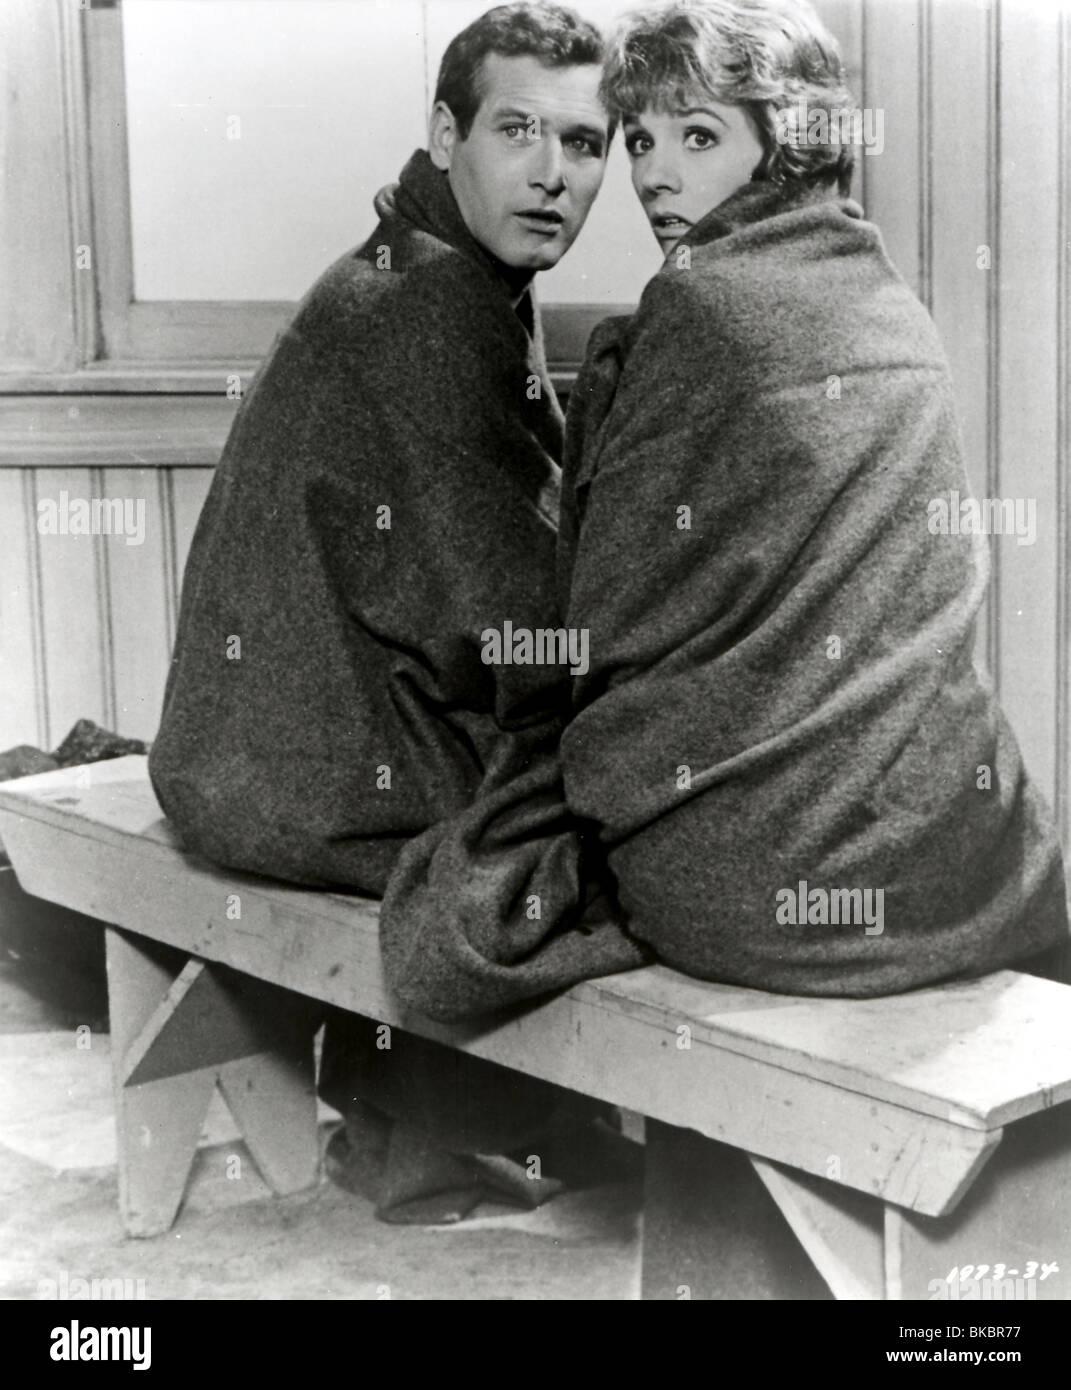 Torn curtain julie andrews - Stock Photo Torn Curtain 1966 Paul Newman Julie Andrews Trct 005p L